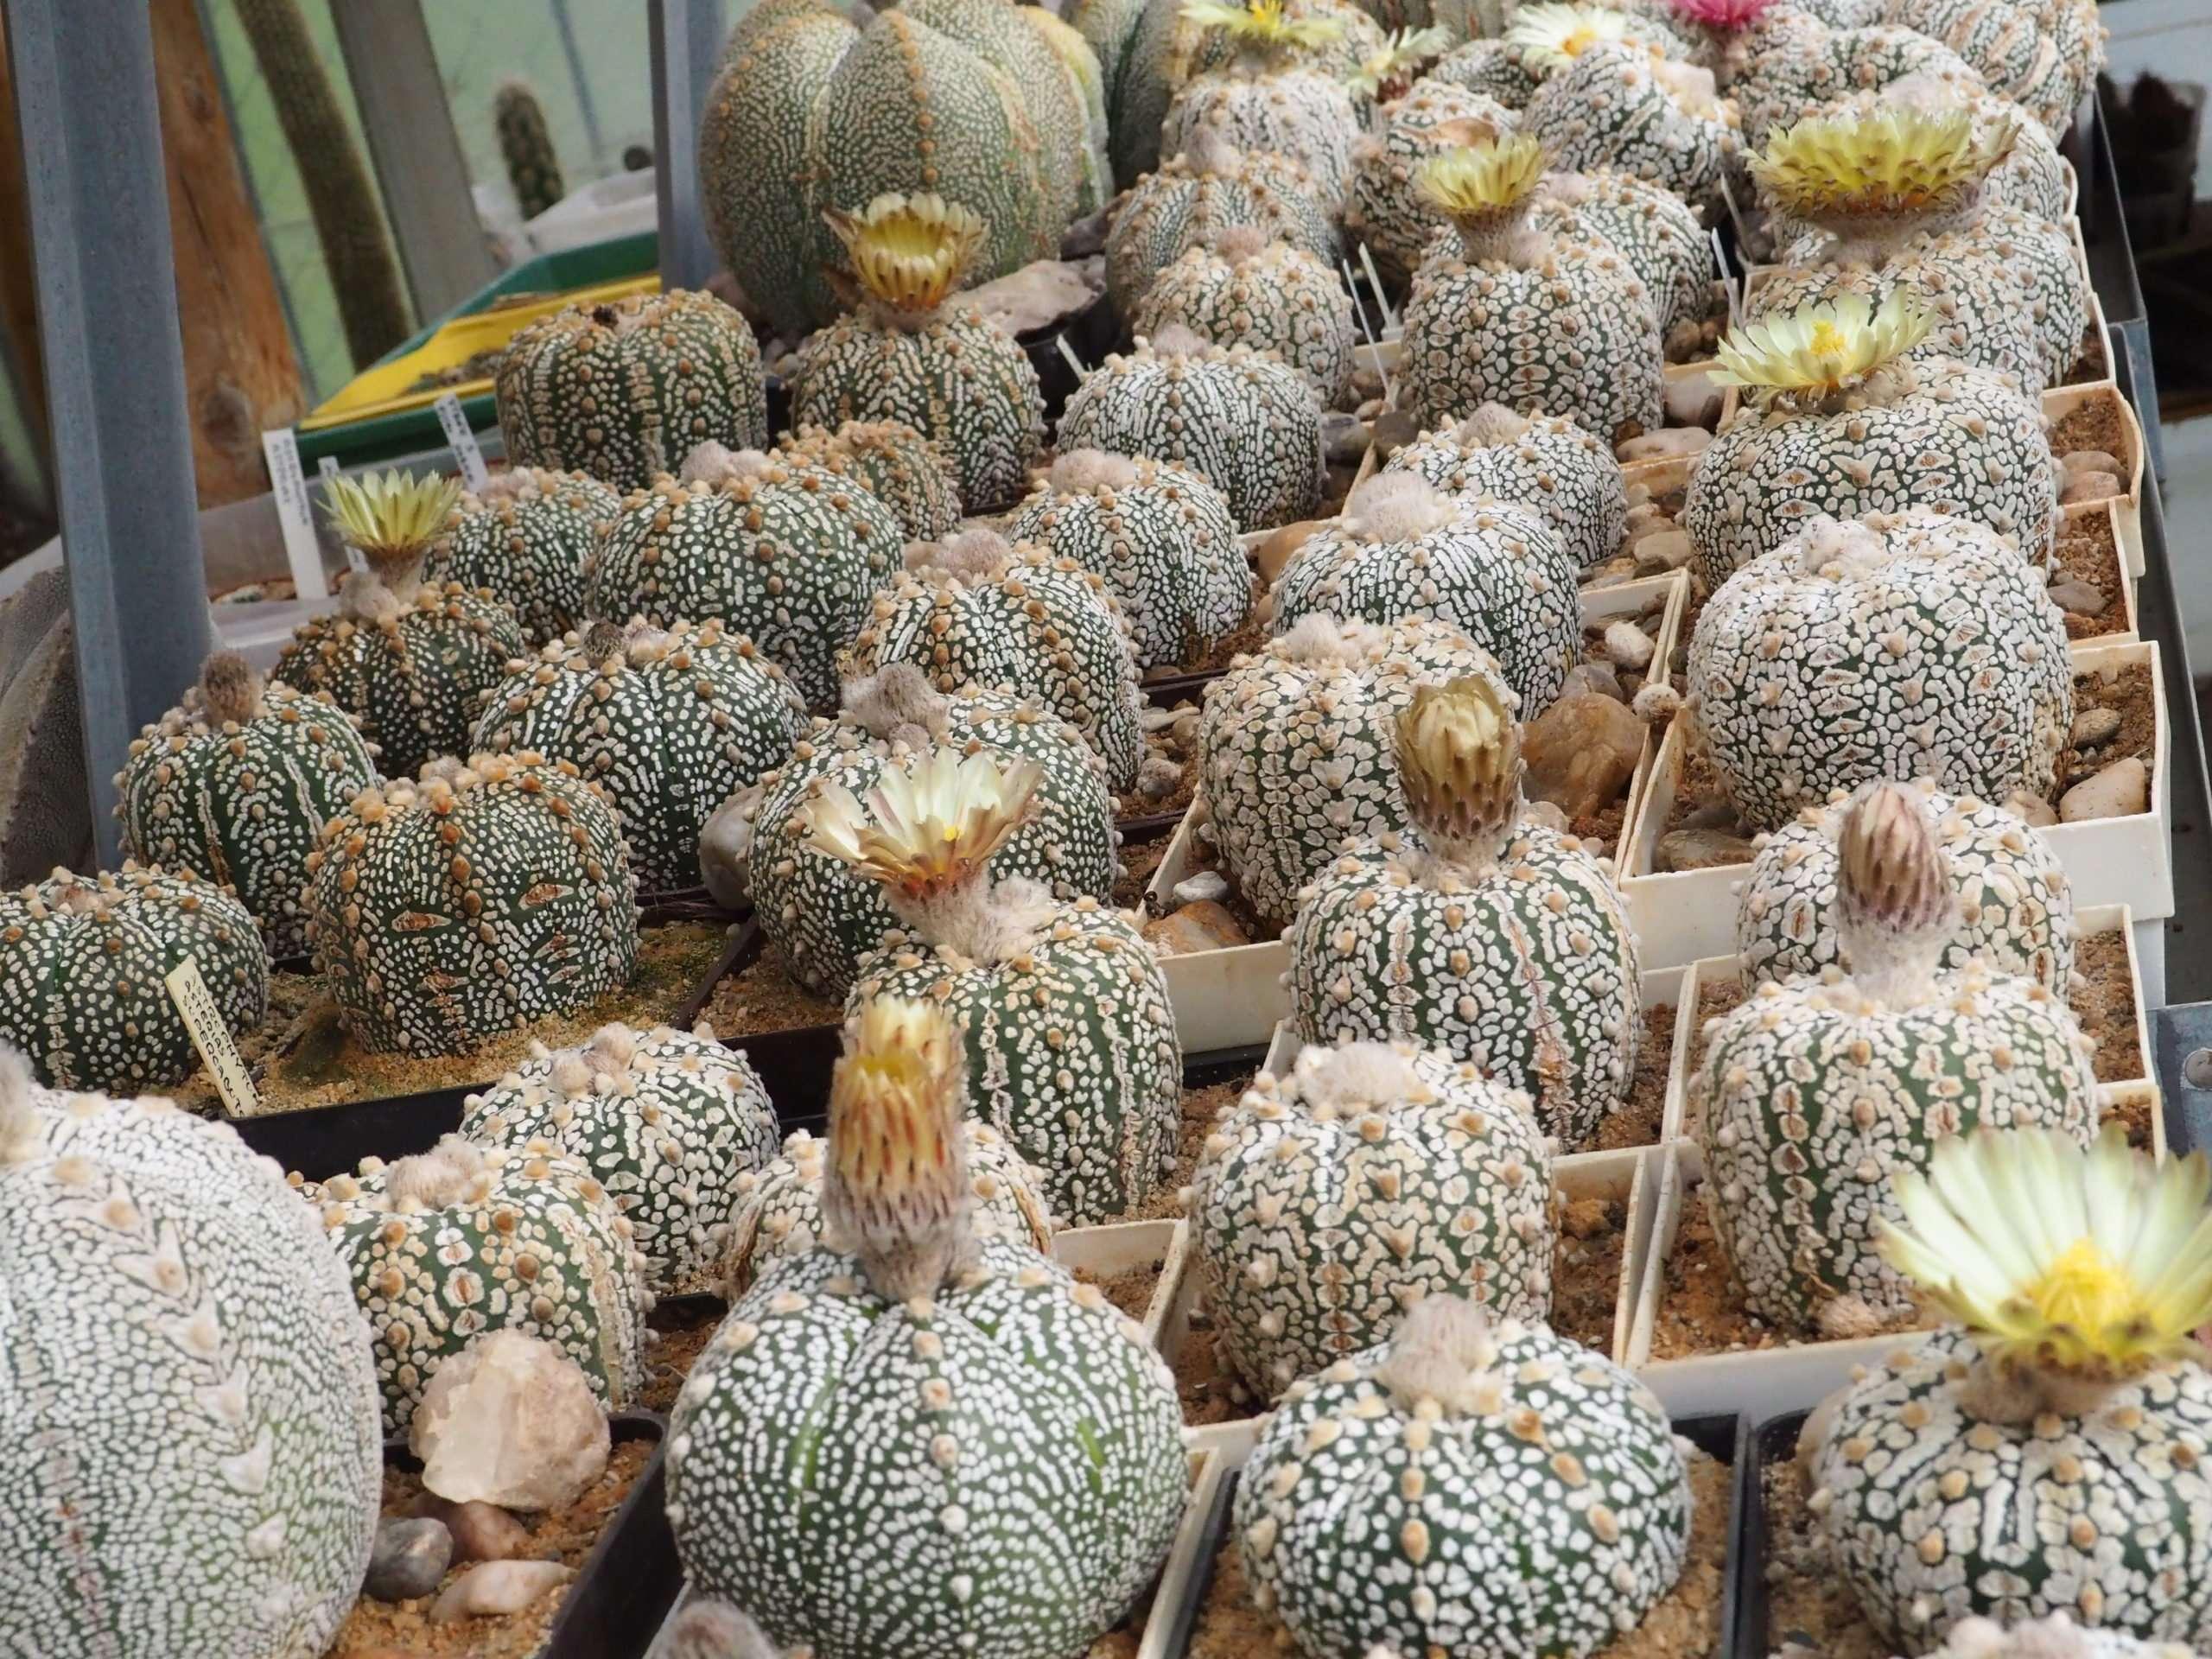 Astrophytum asterias cv. Supercabuto